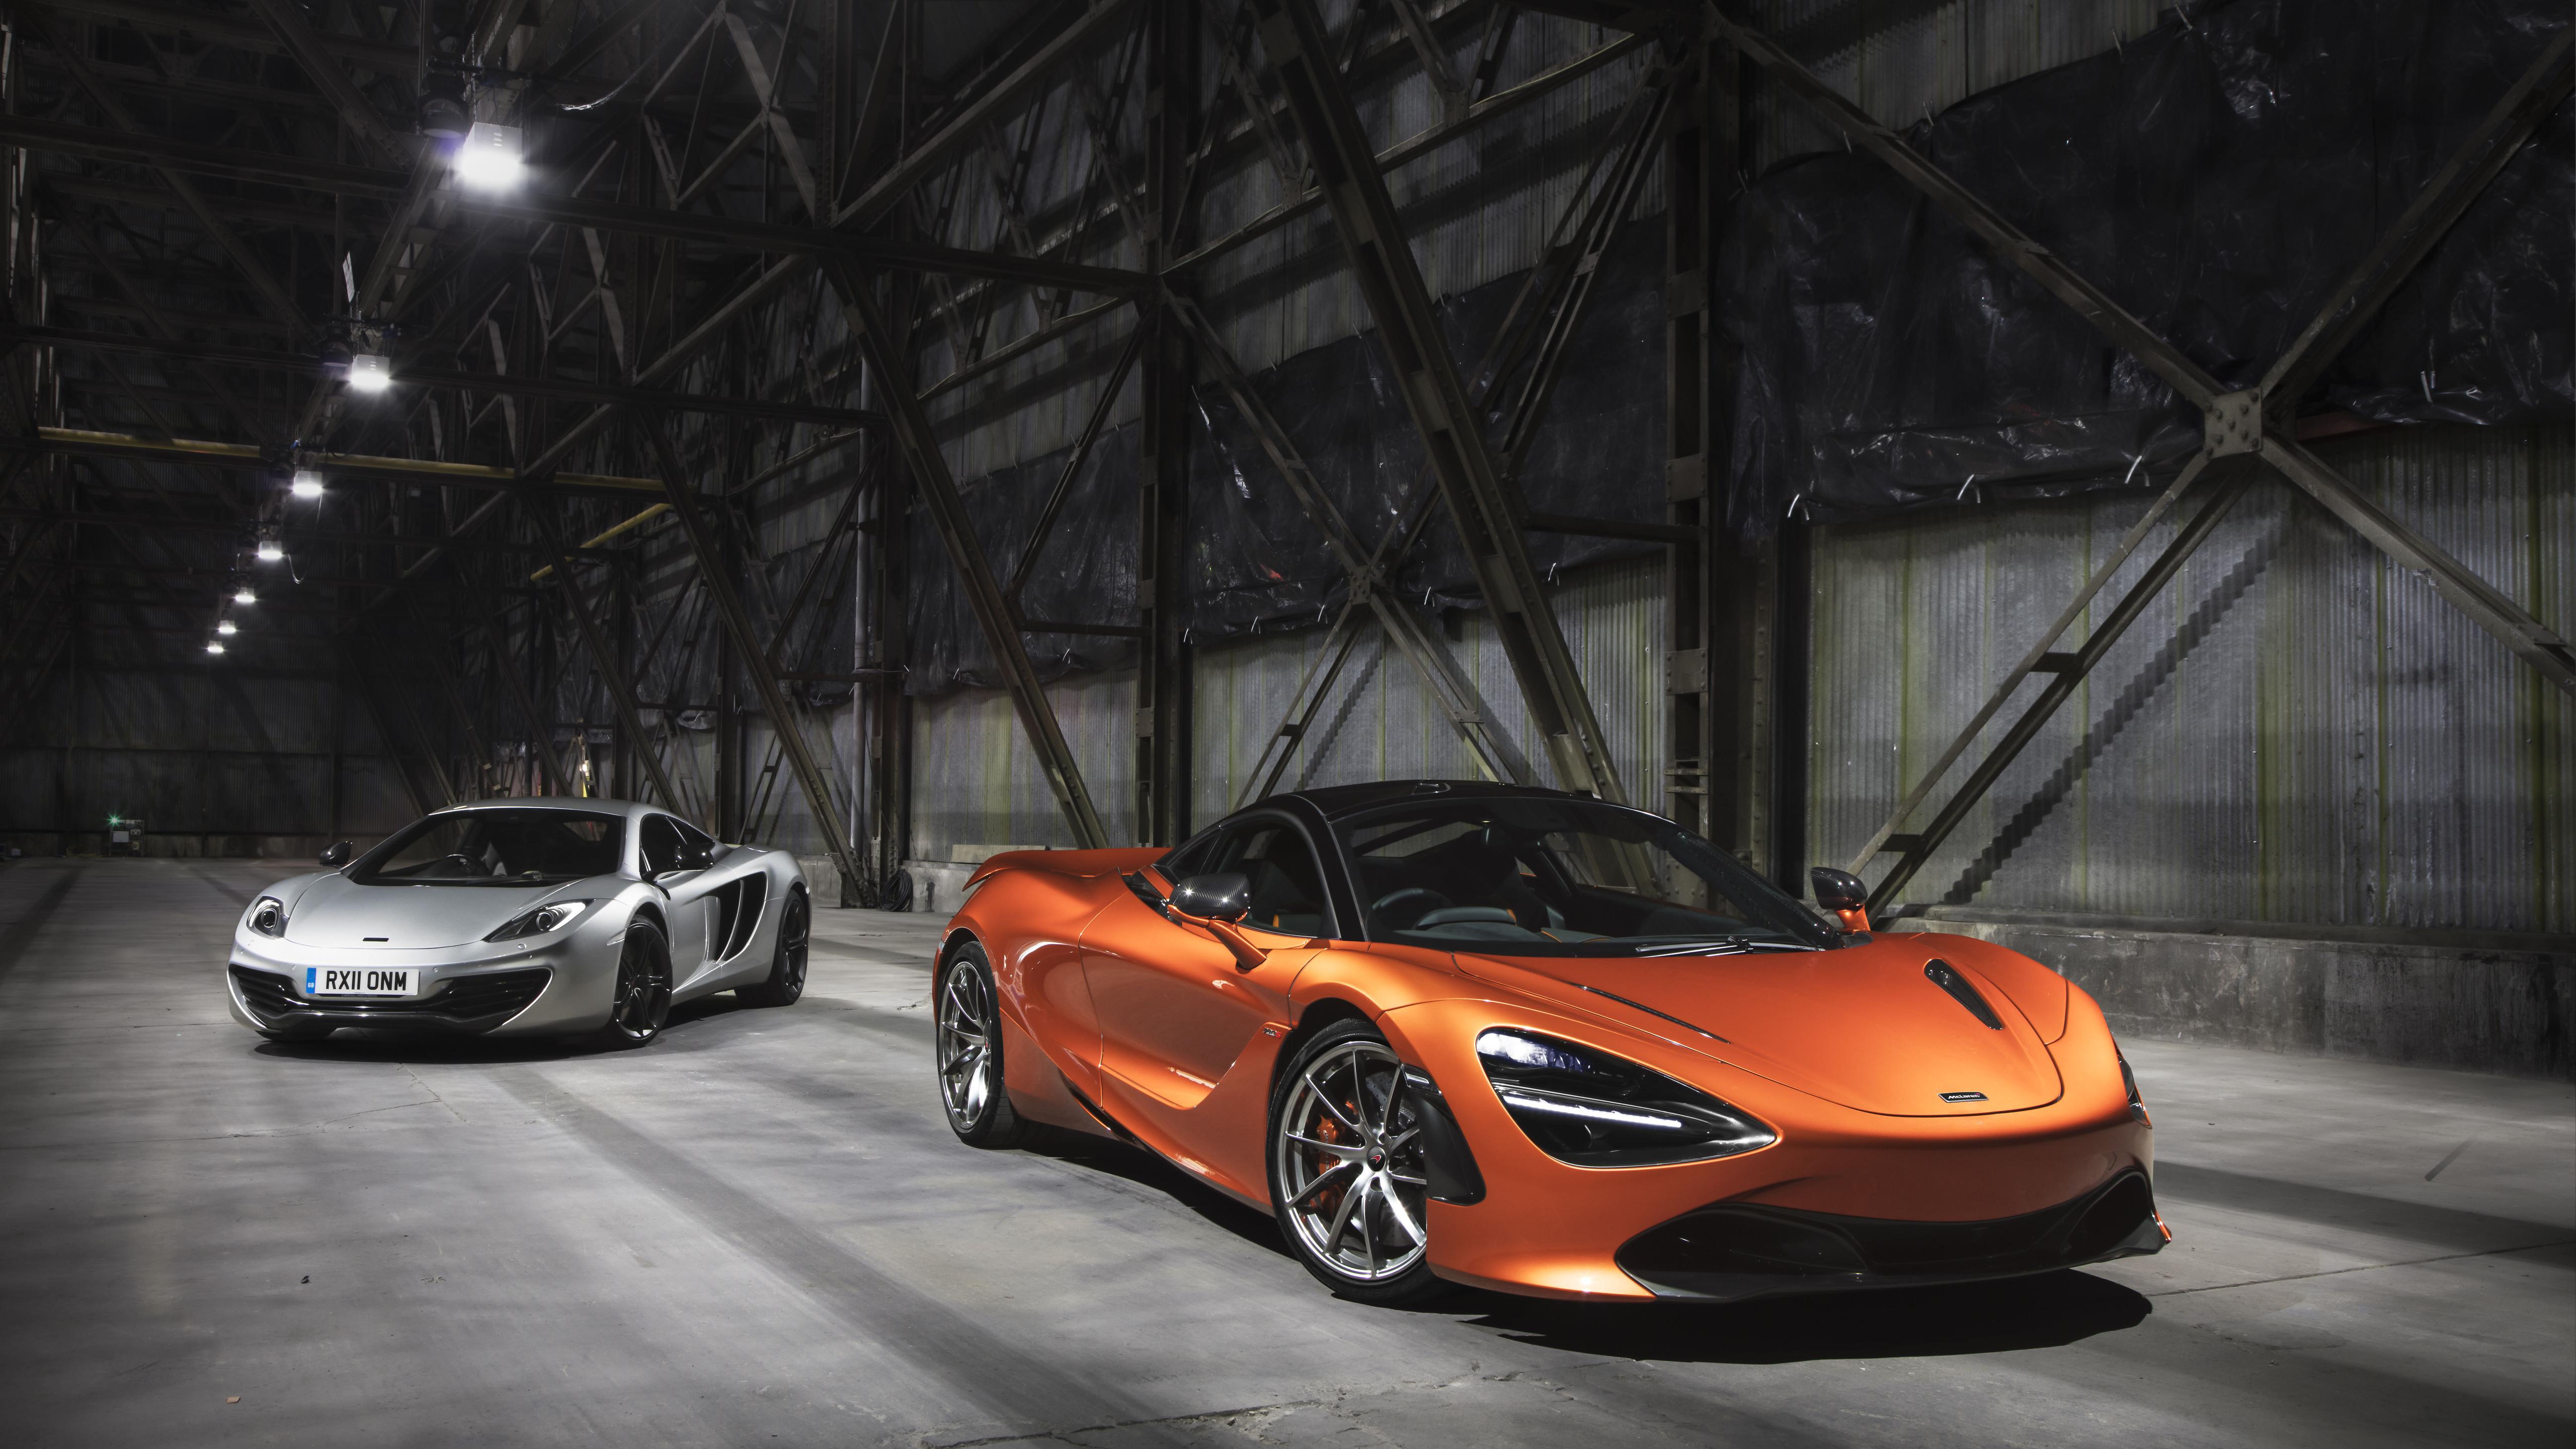 Orange McLaren P1 Concept - Sport car Wallpaper Download 5120x2880